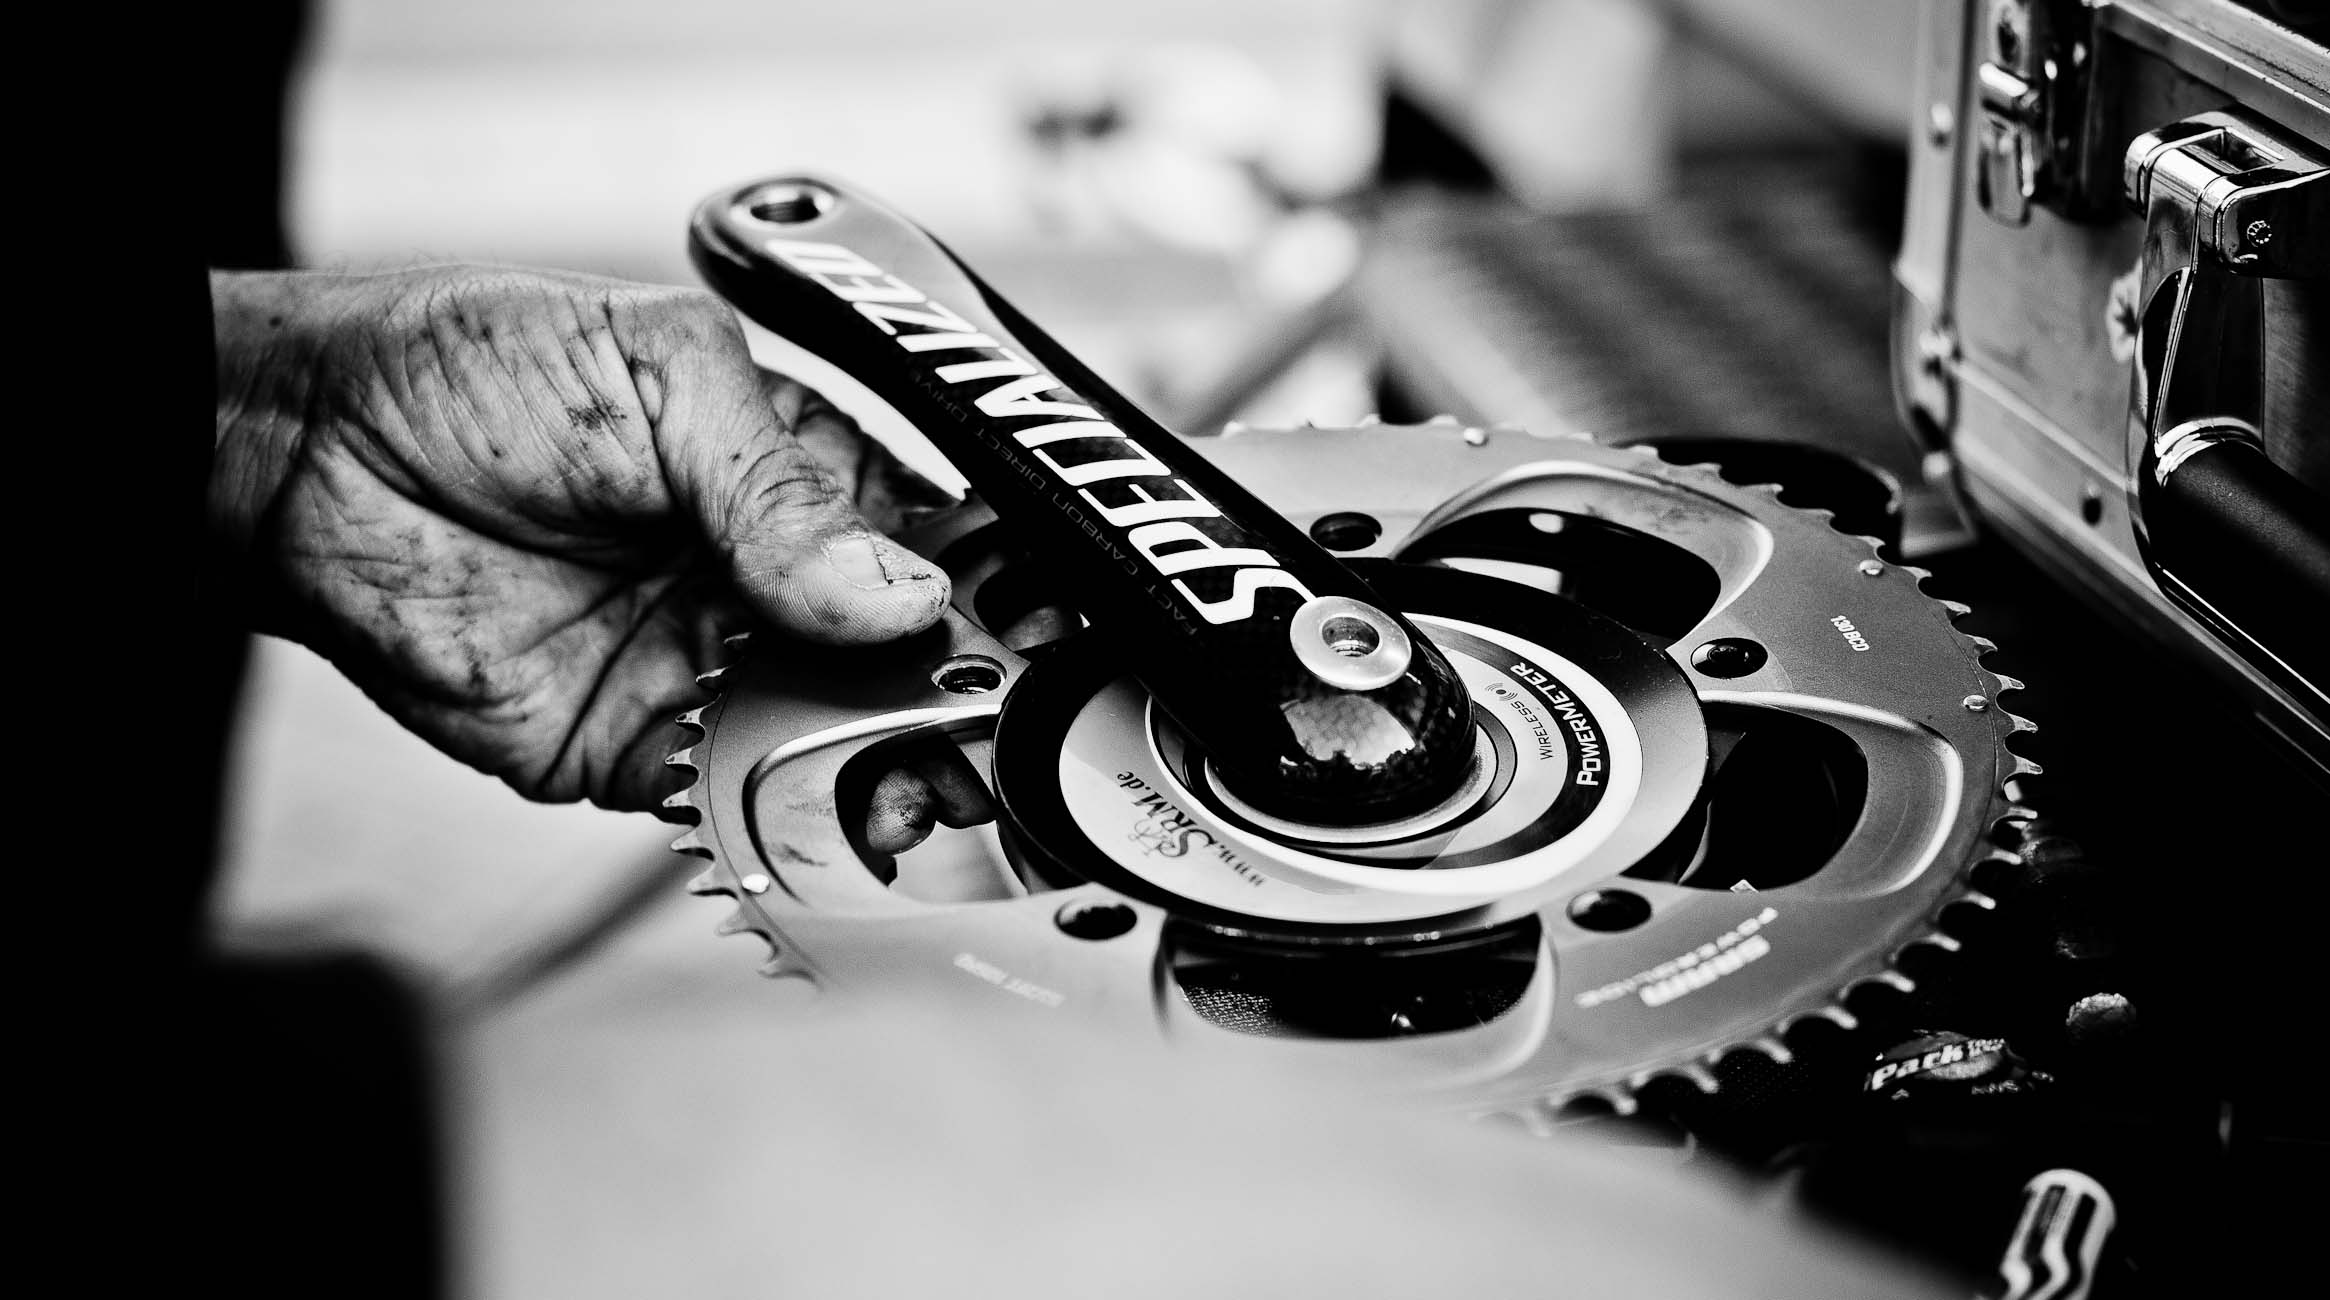 mechanic working on crankset